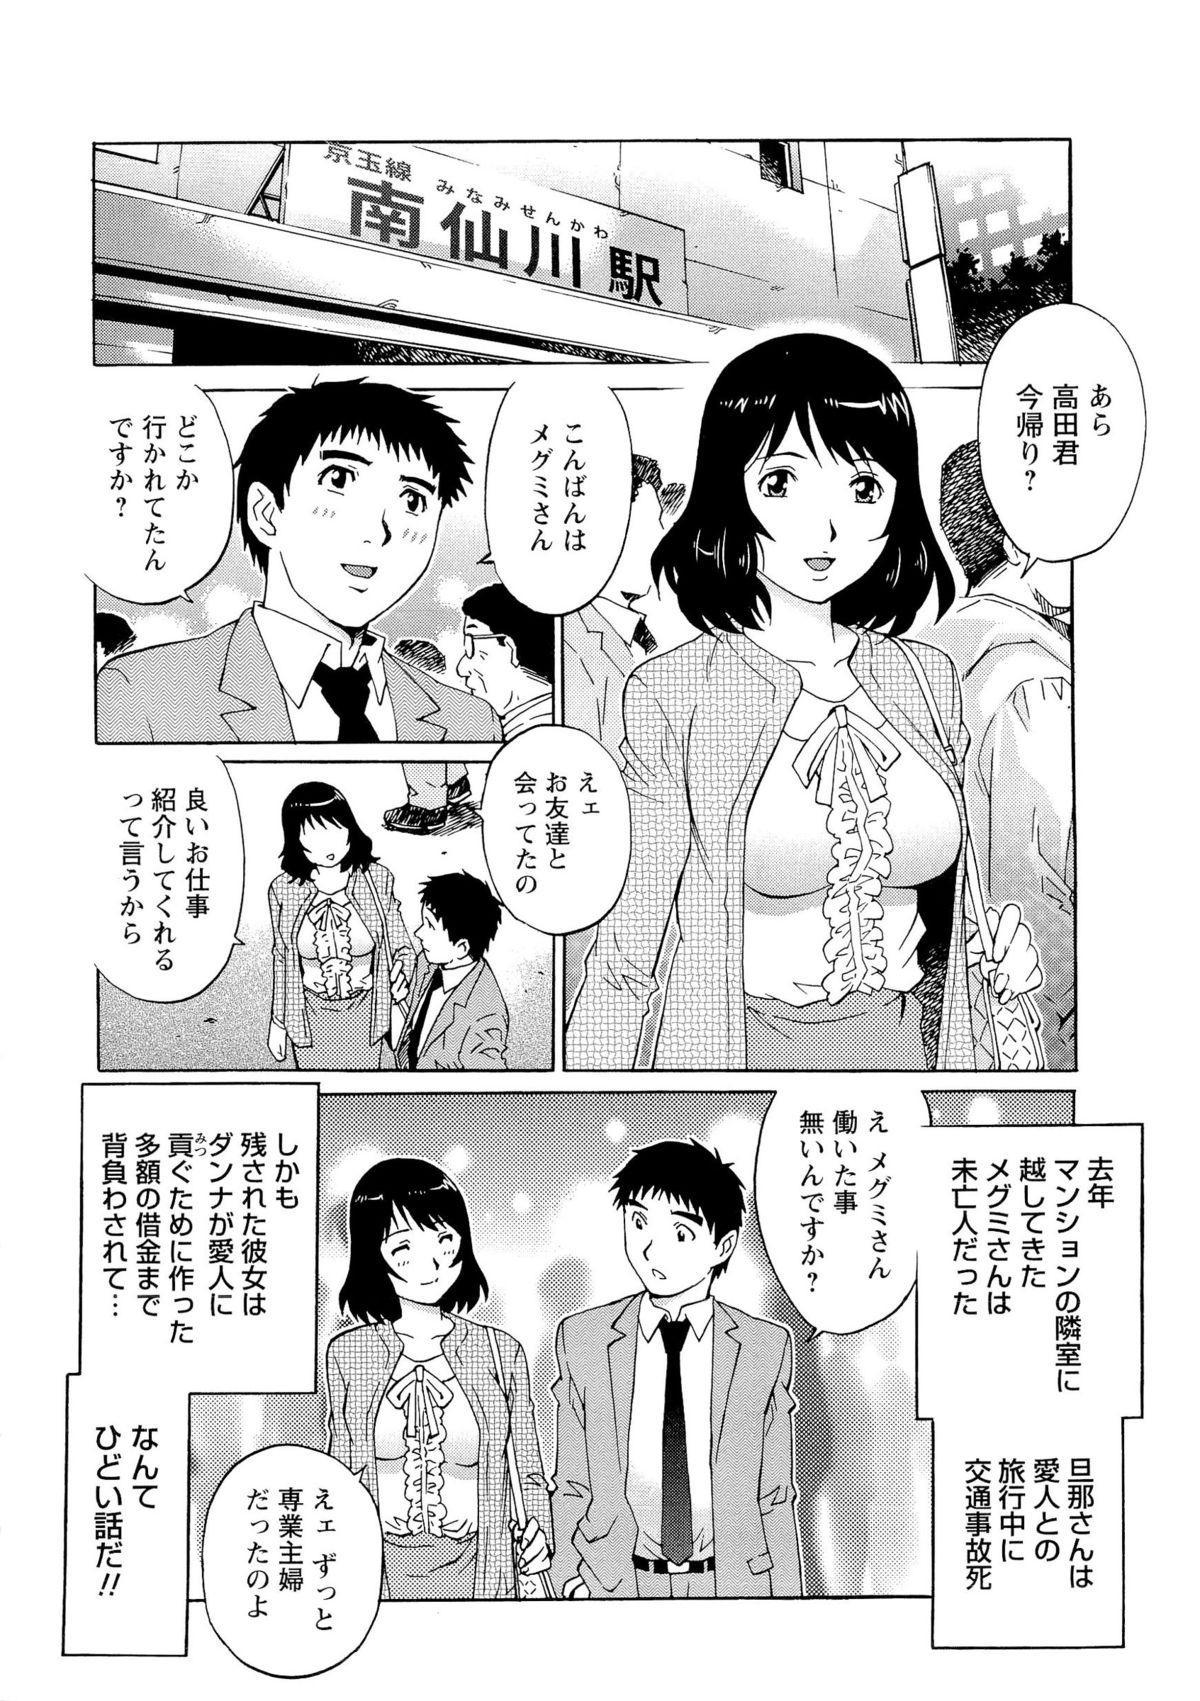 Nureteru Hitozuma - Wetly Wife 166